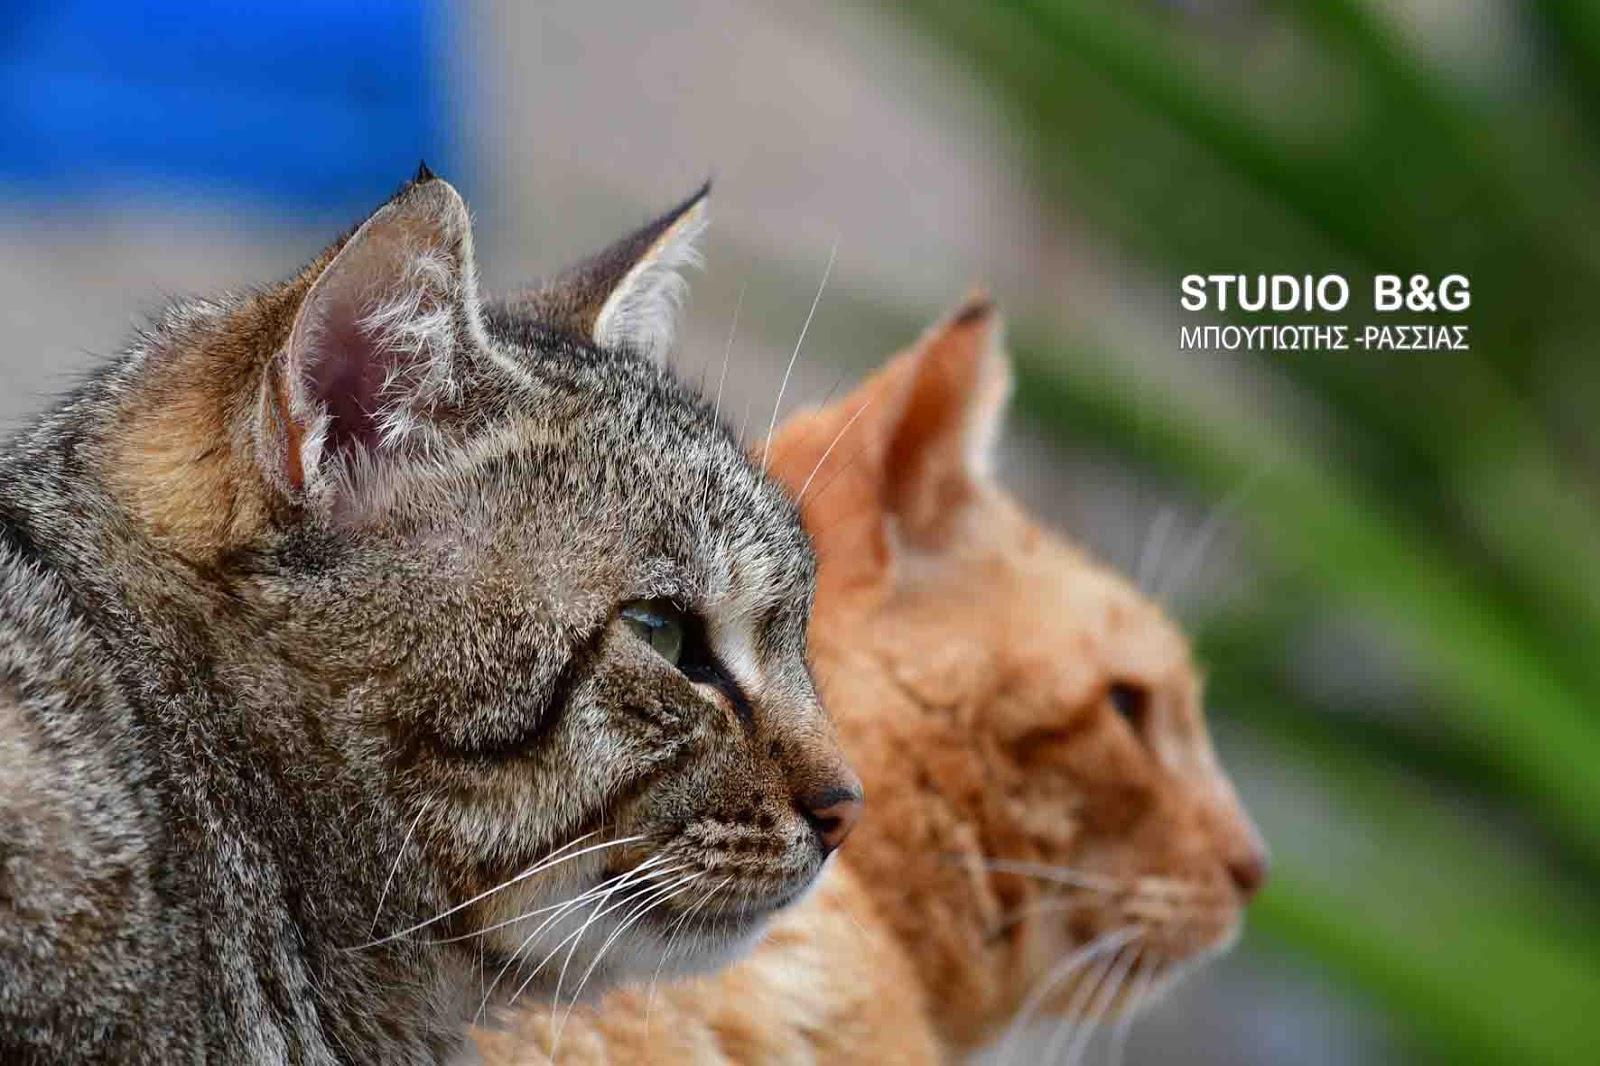 7efecf8817e6 Η φωτογραφία της ημέρας  Η Γάτα του Αιγαίου - Αργολικές Ειδήσεις